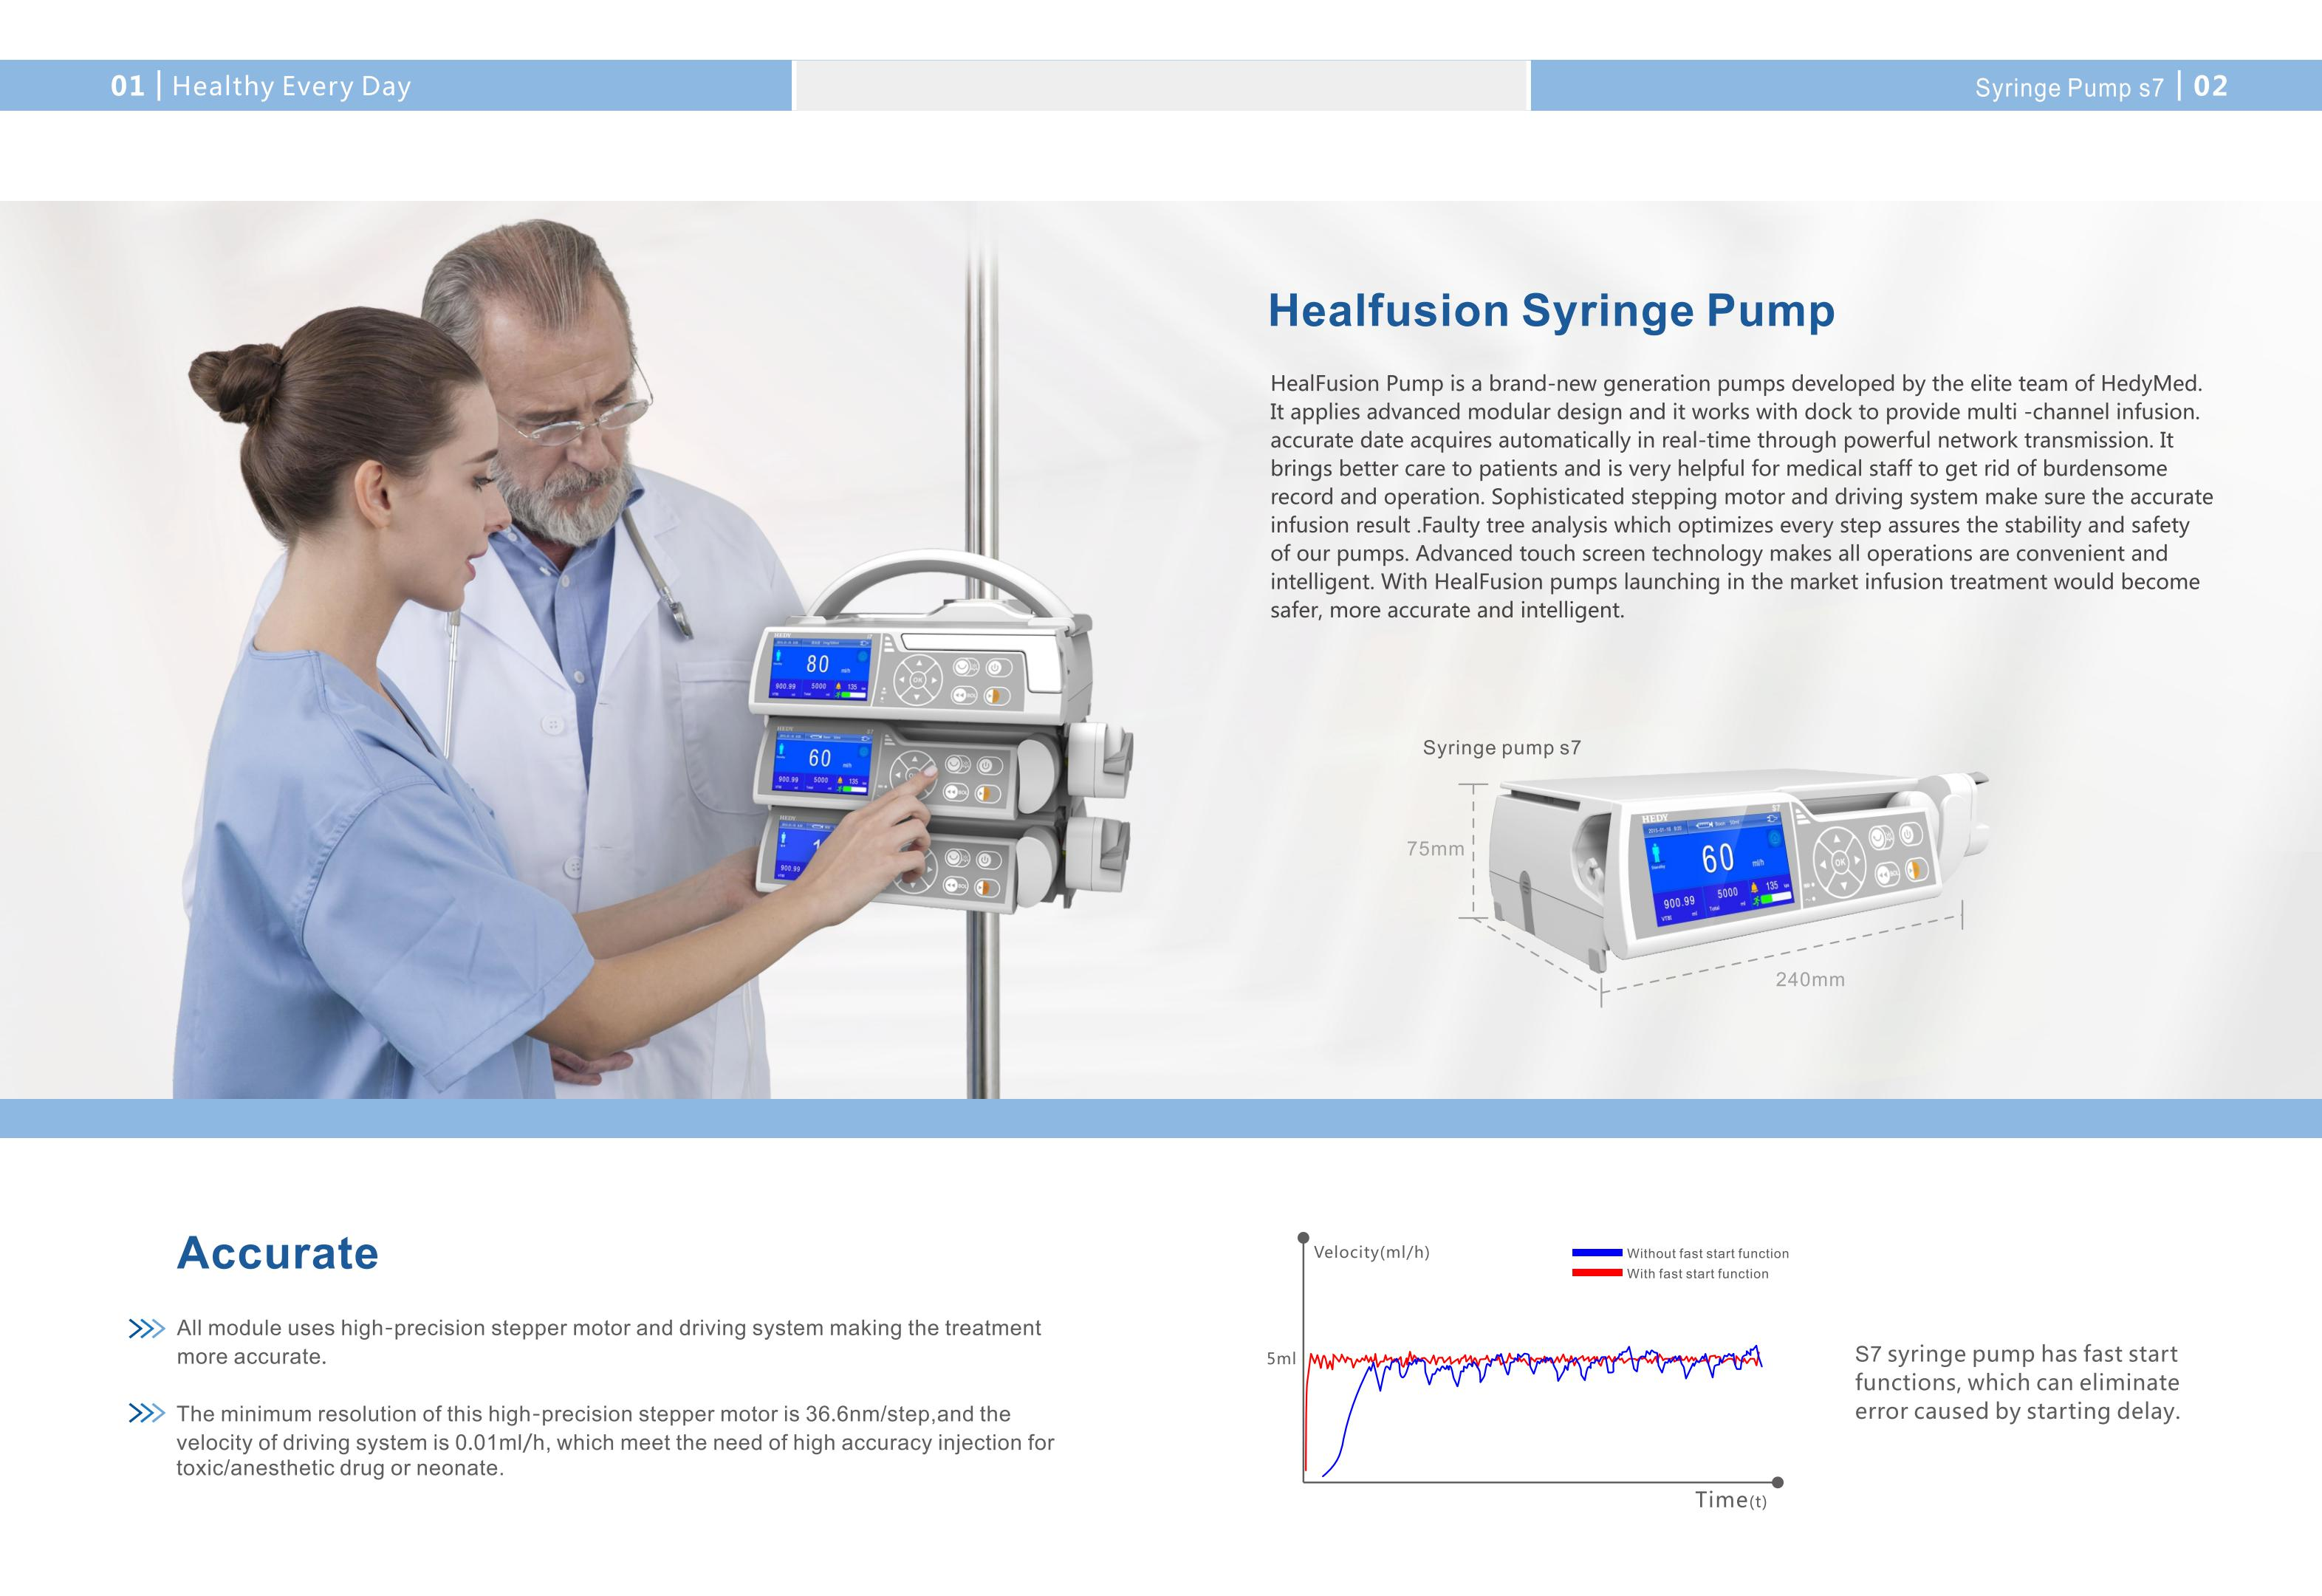 syringe pump Electric automatic portable syringe pump with drug library syringe pump